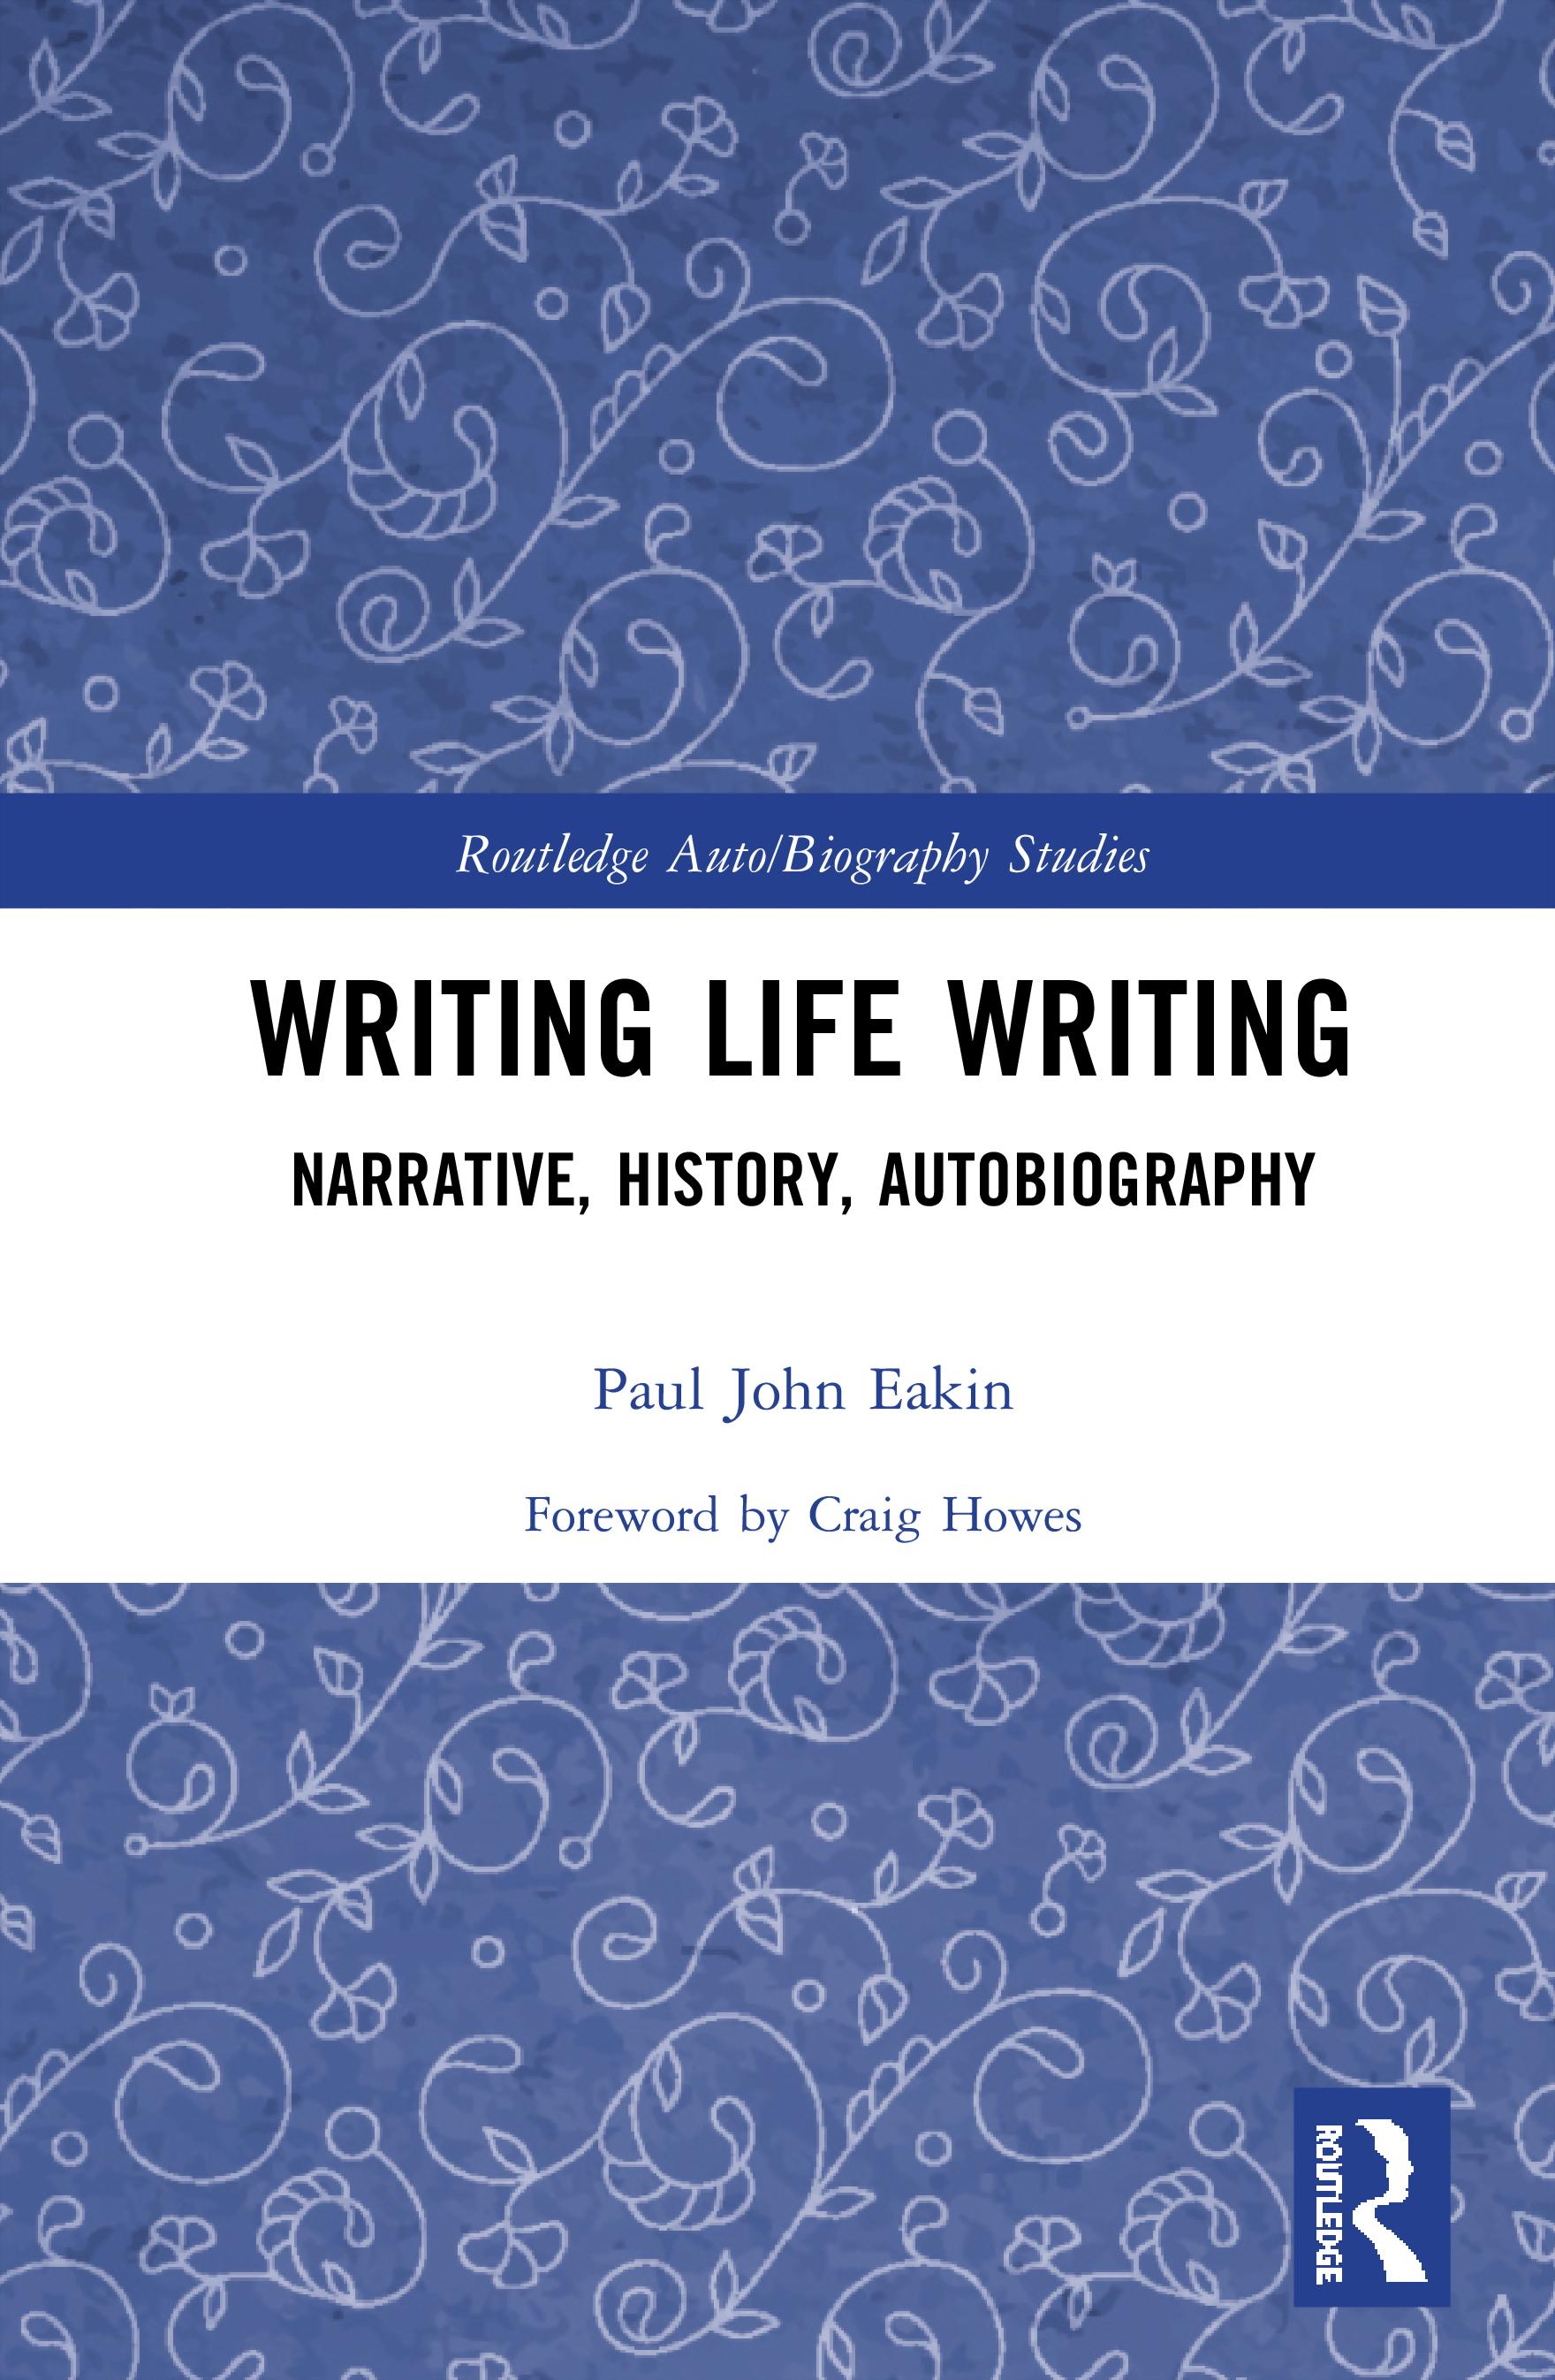 Writing Life Writing: Narrative, History, Autobiography